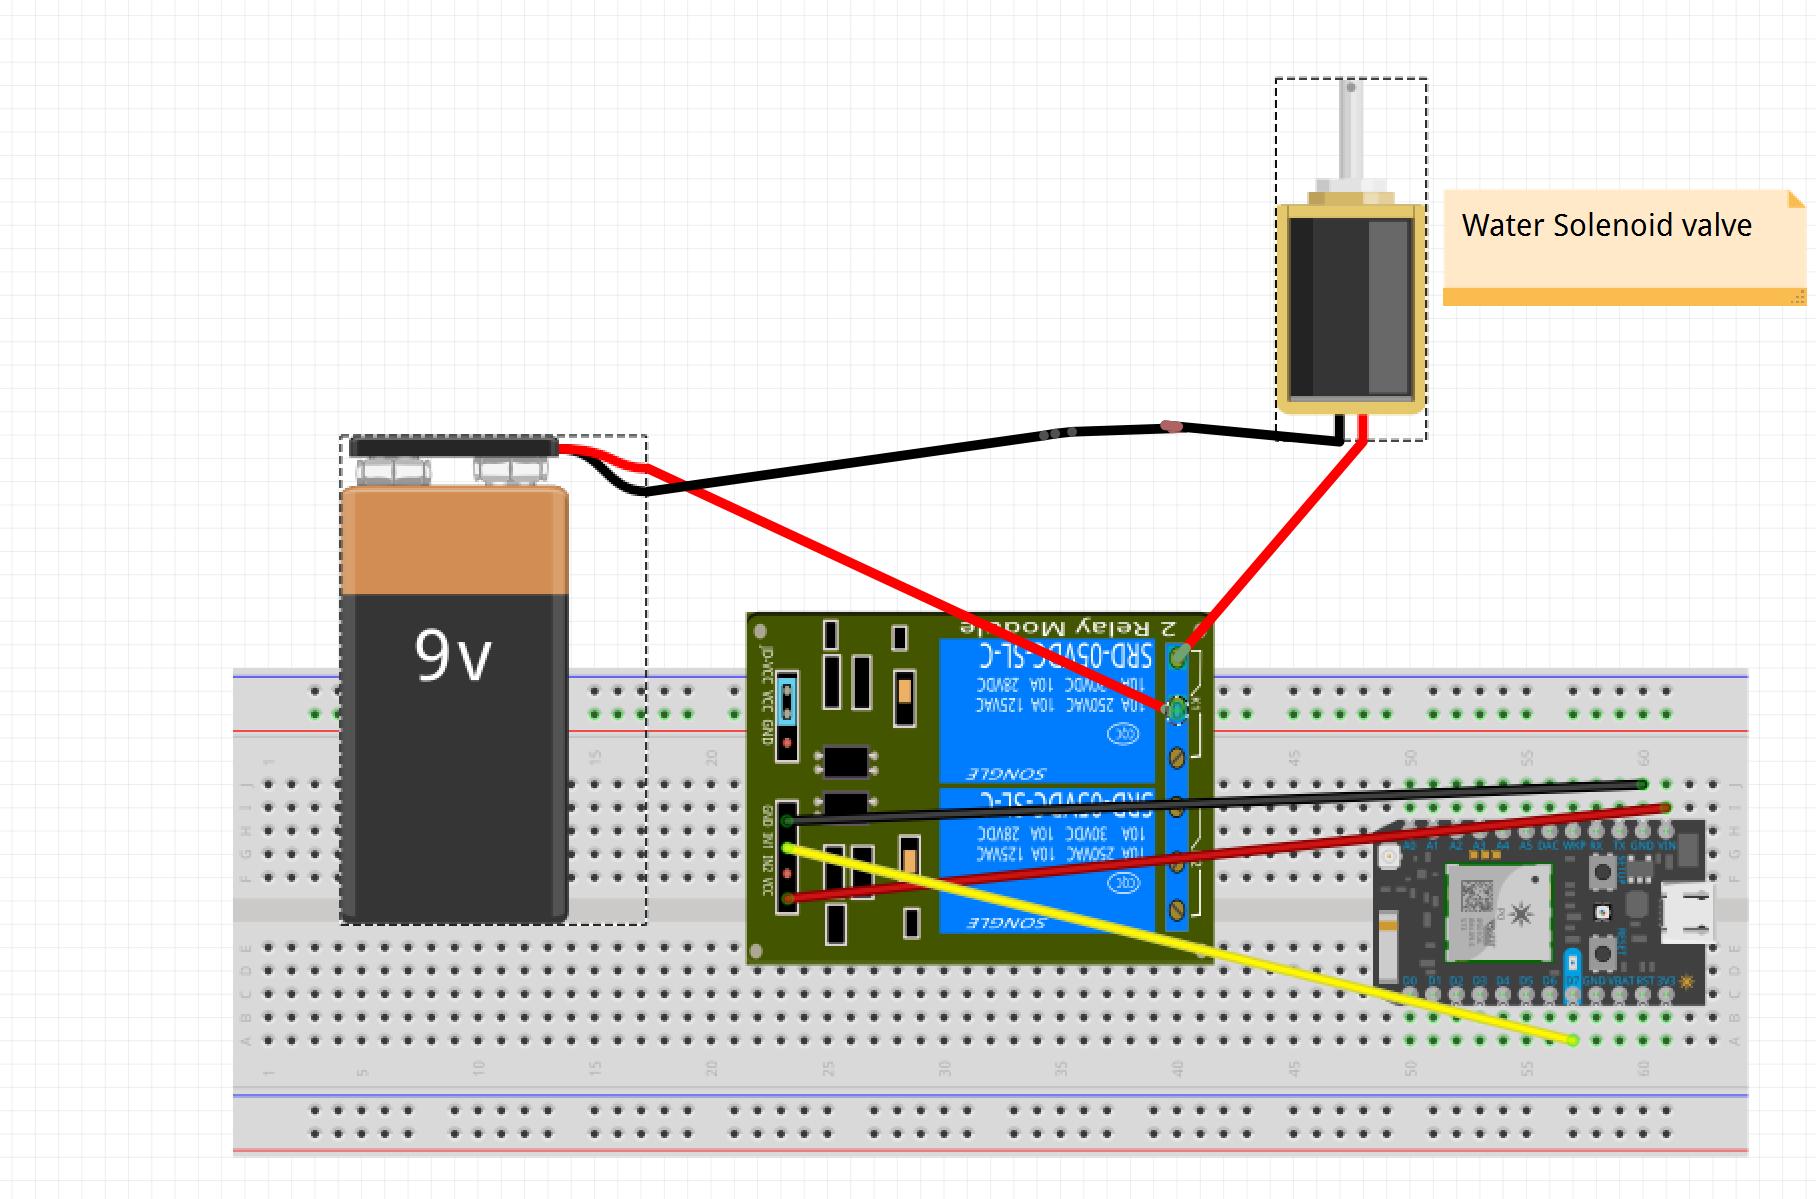 Smart Smoke Detector Brk Detectors Wiring Diagram Water Valve Circuit B3xjitgsbt